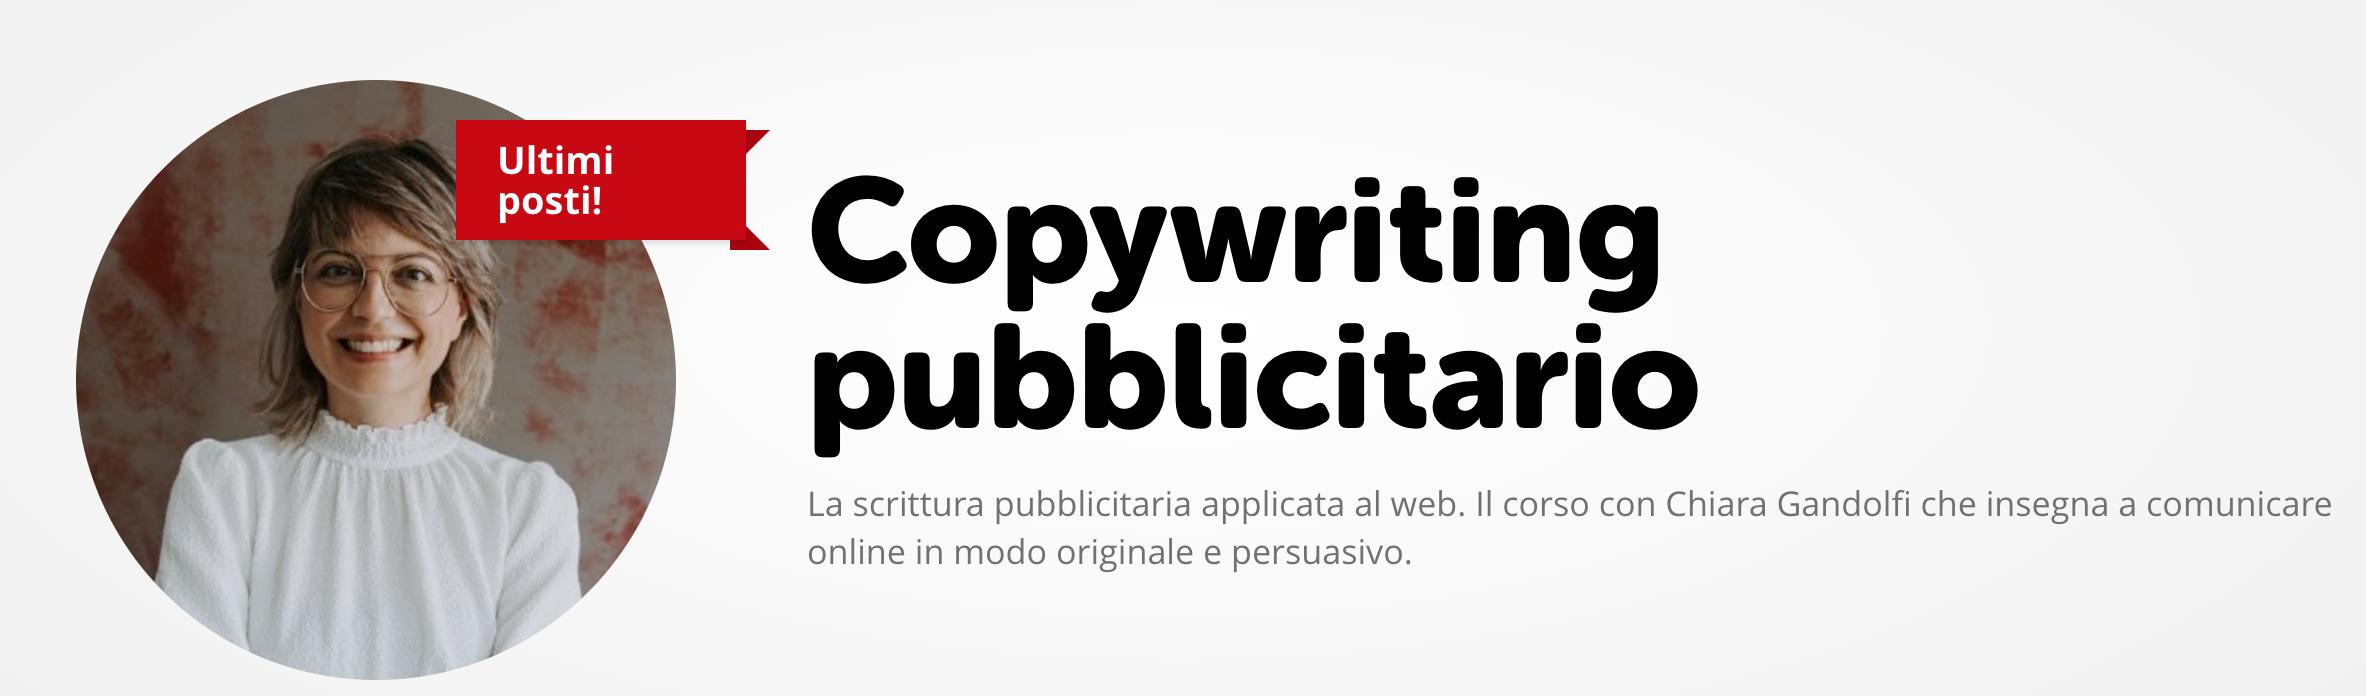 Corsi Copywriting_screenshot Chiara Gandolfi